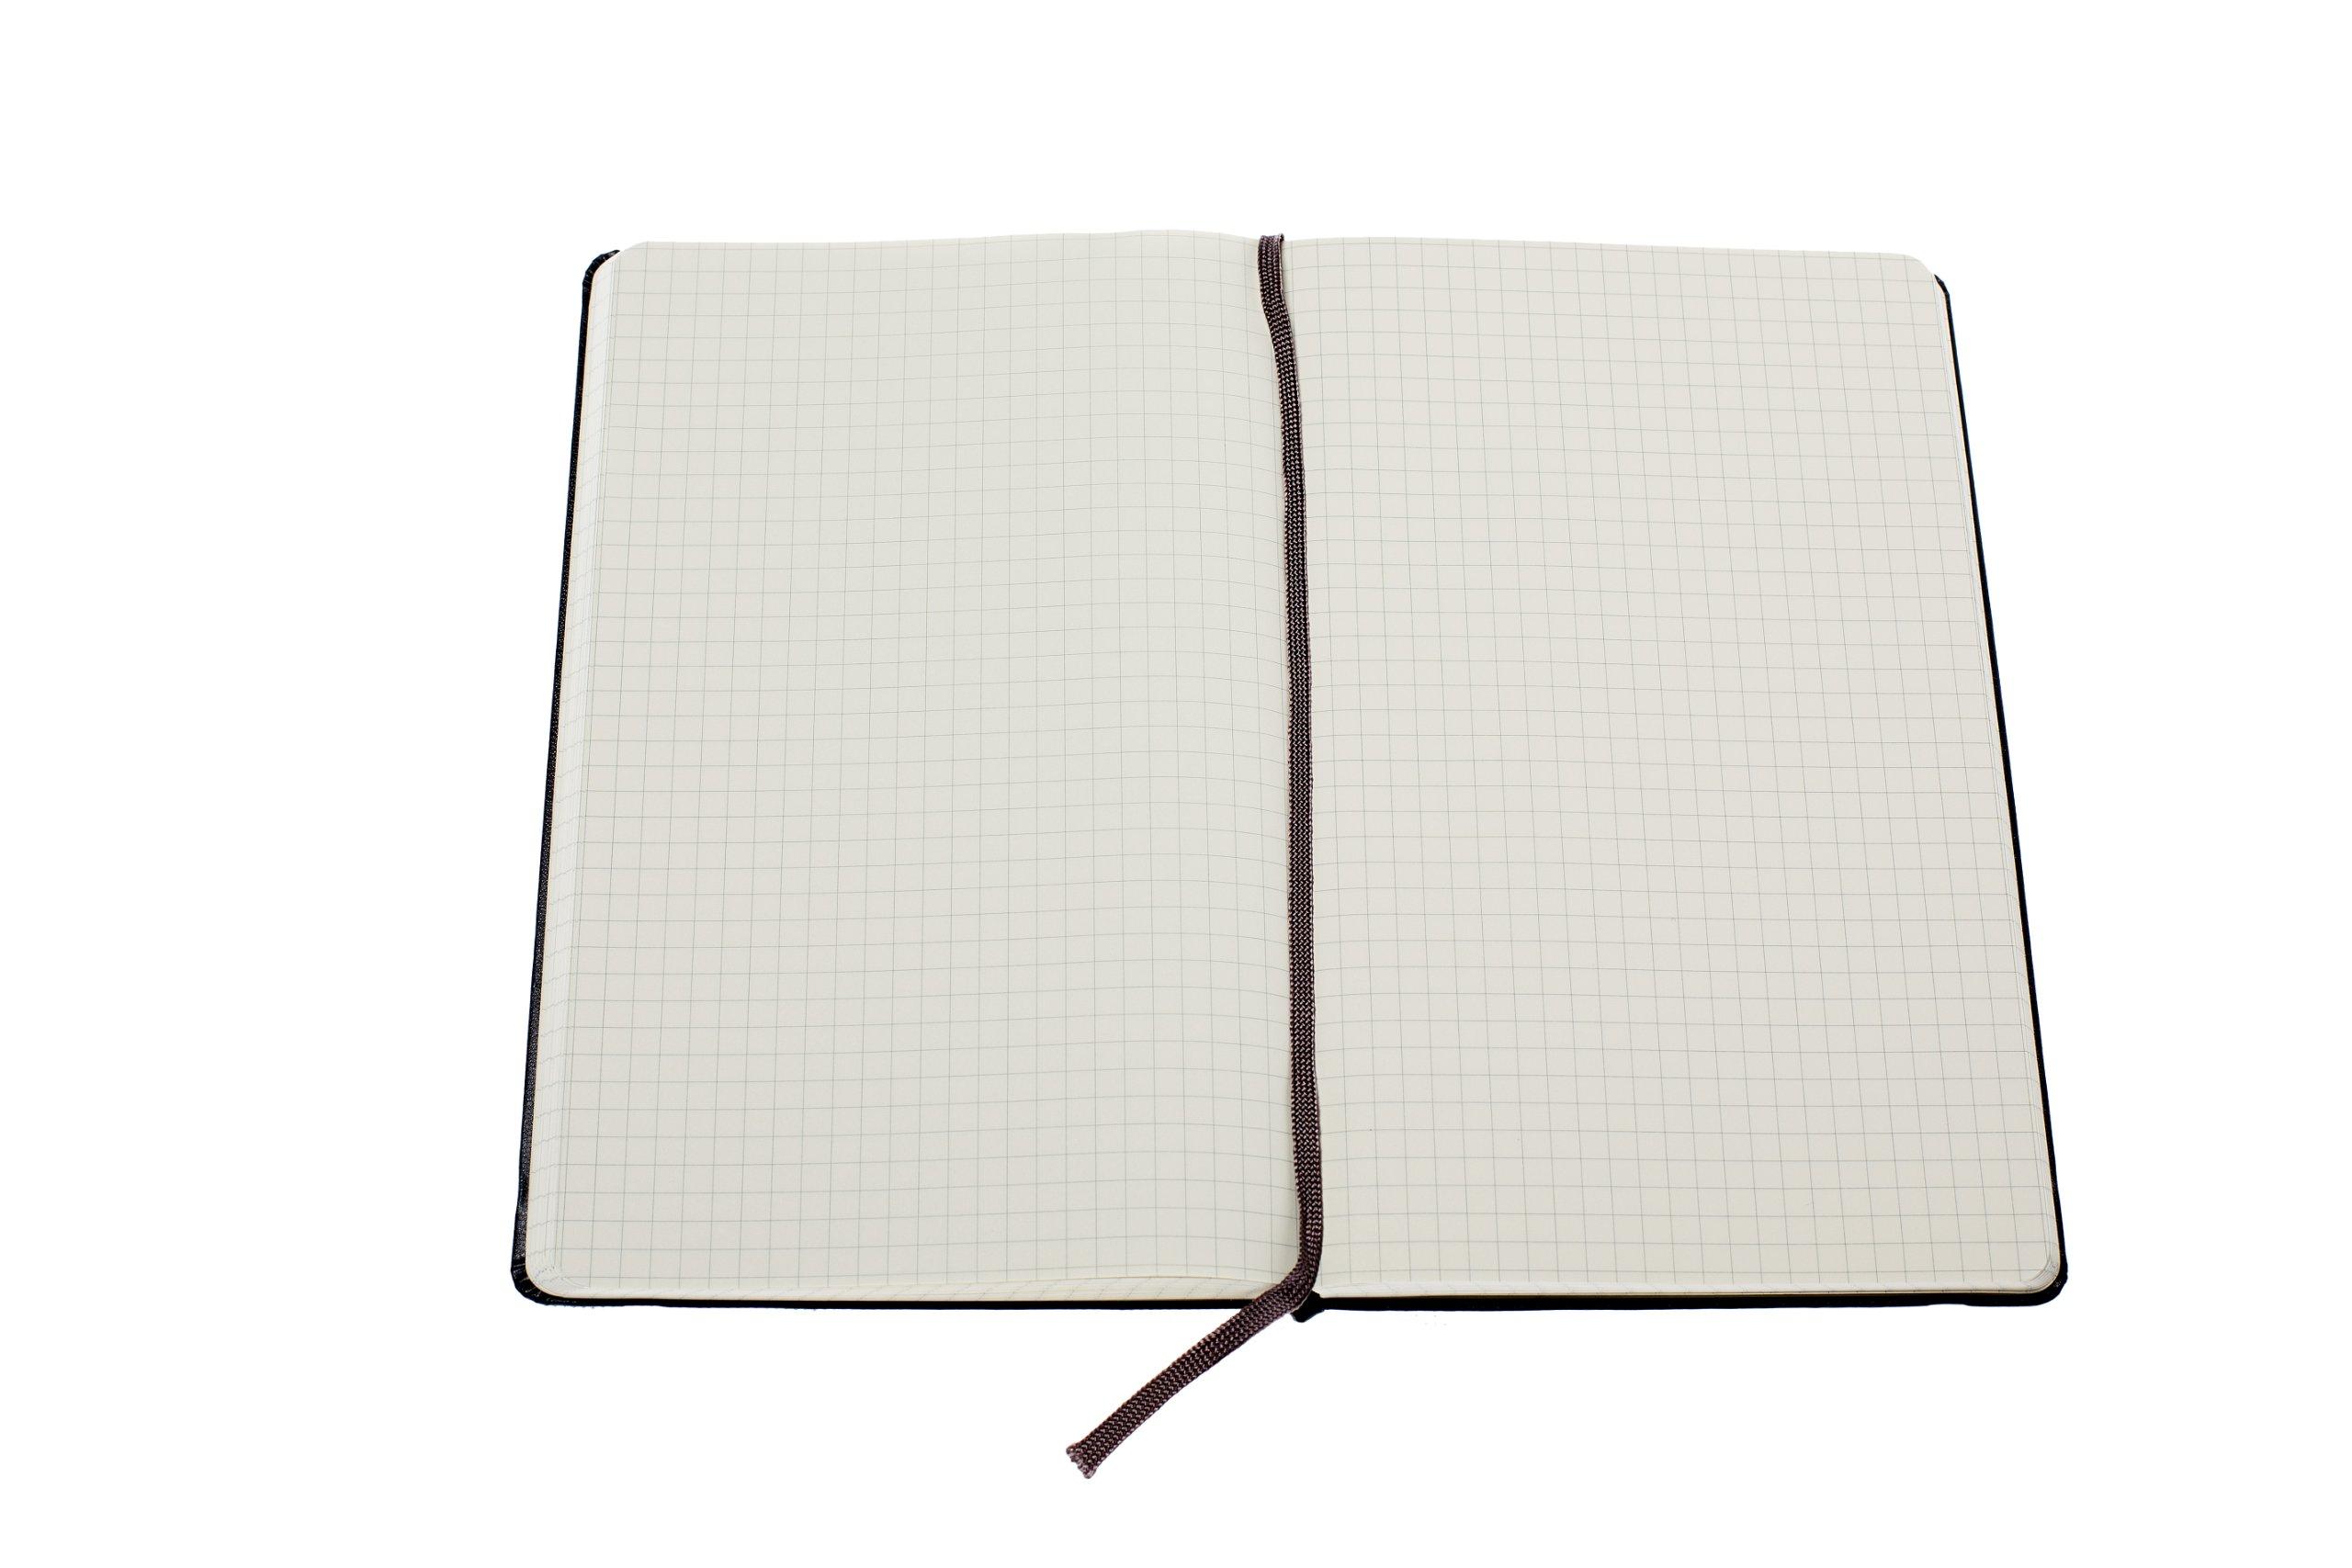 amazoncom moleskine classic notebook large squared black hard cover 5 x 825 classic notebooks 5055941933905 moleskine books